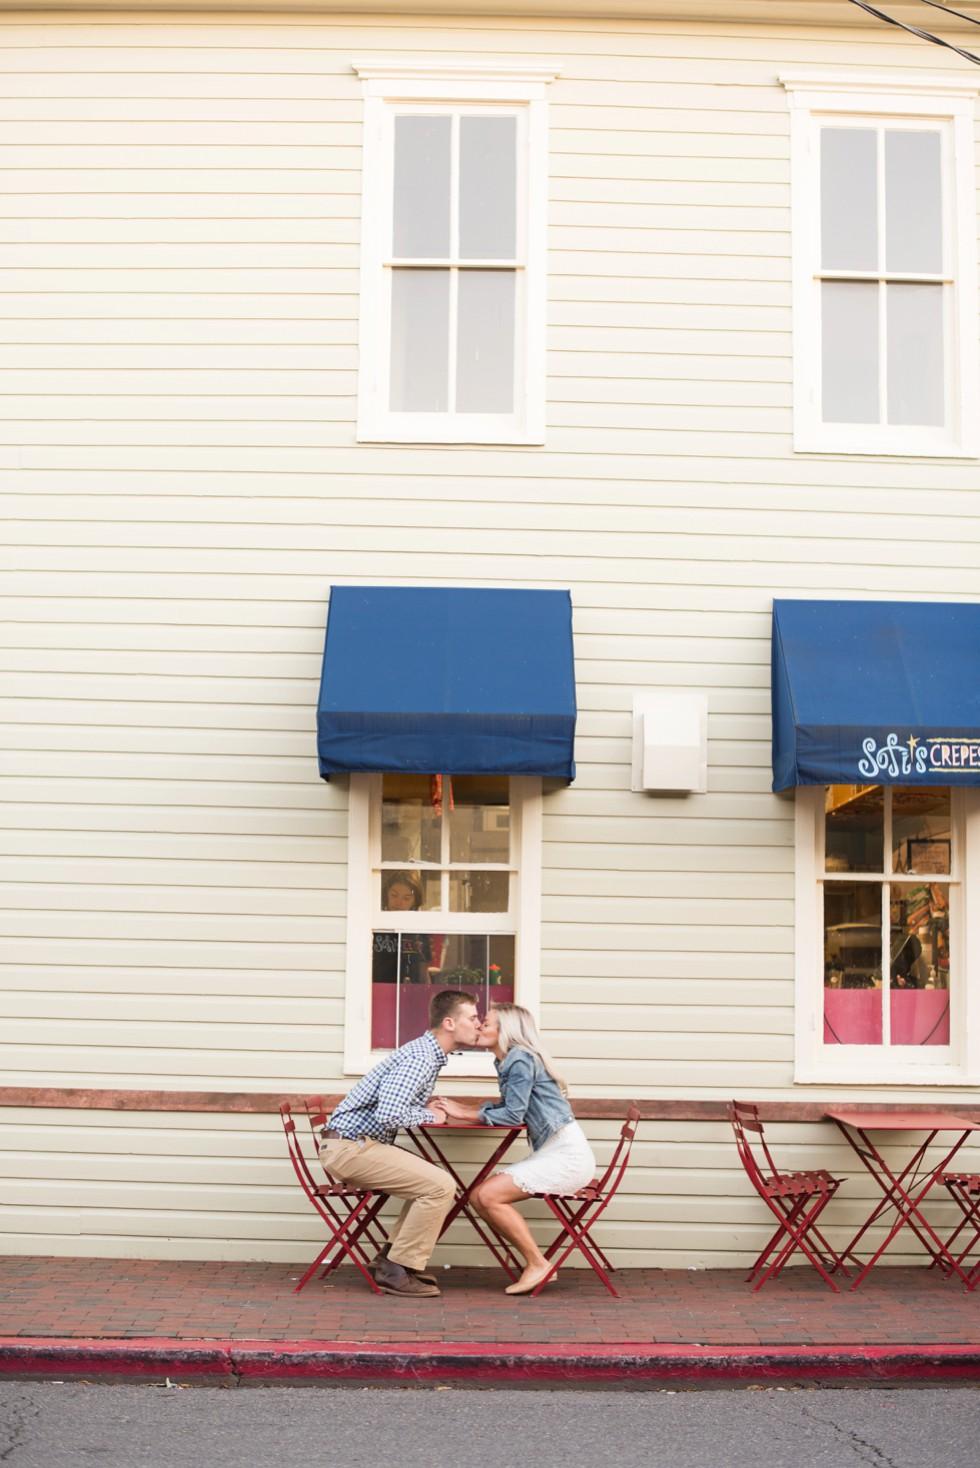 Annapolis engagement photos at Sofi's Crepes